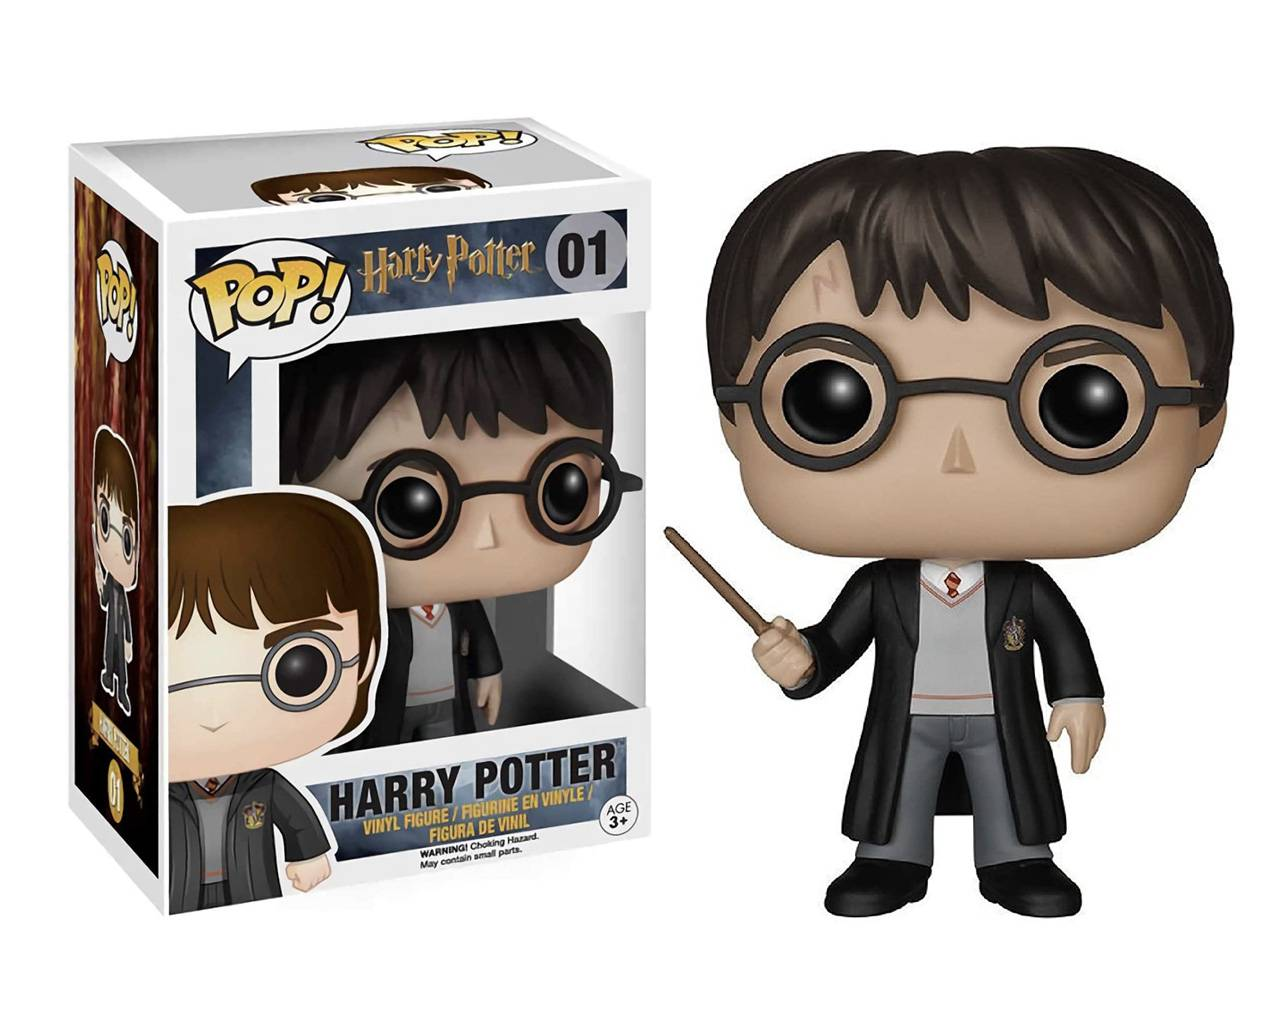 Harry Potter (Wand) Pop! Vinyl